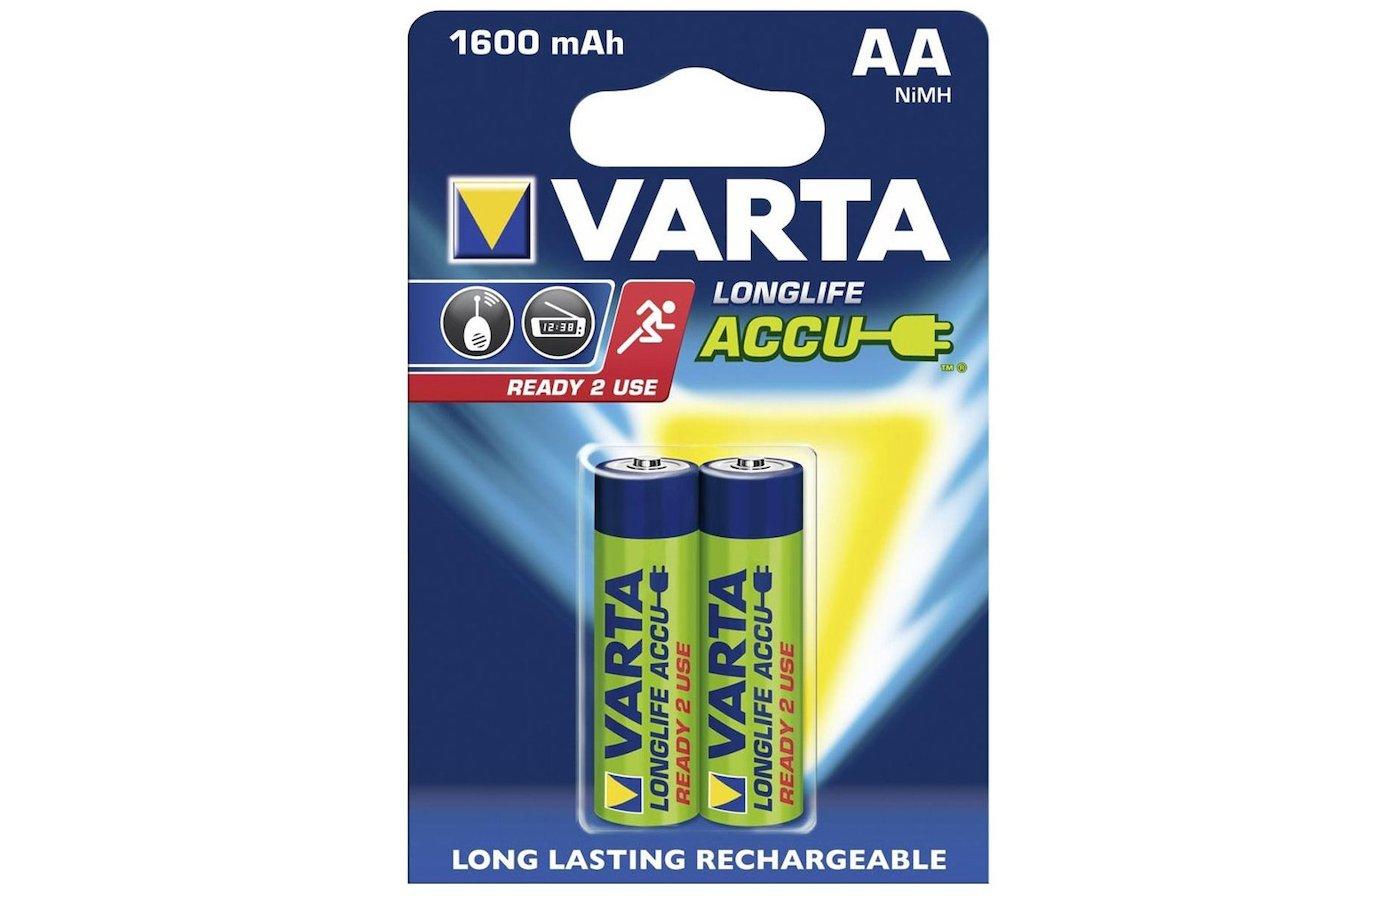 Аккумулятор VARTA AA 1600mAh Ni-Mh 2шт.